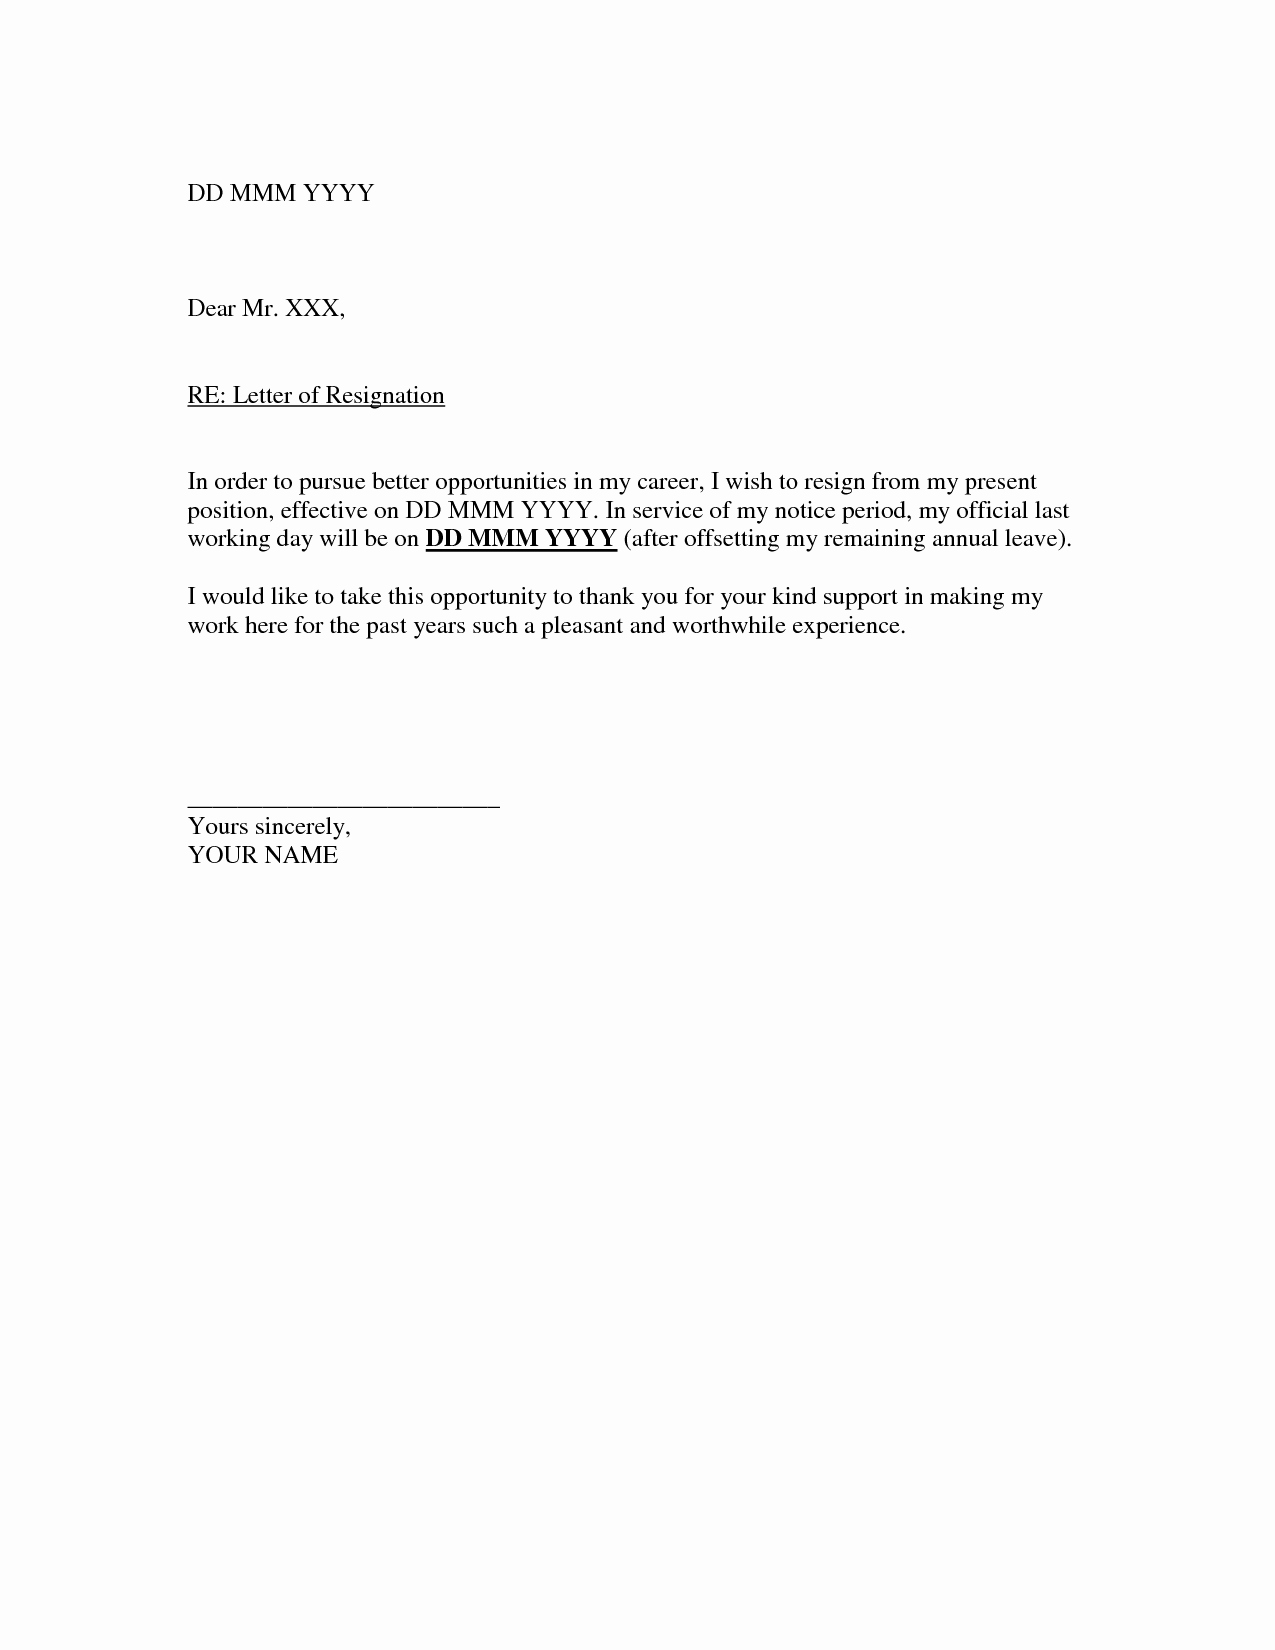 Resignation Letter Template Free Elegant Resignation Letter Template